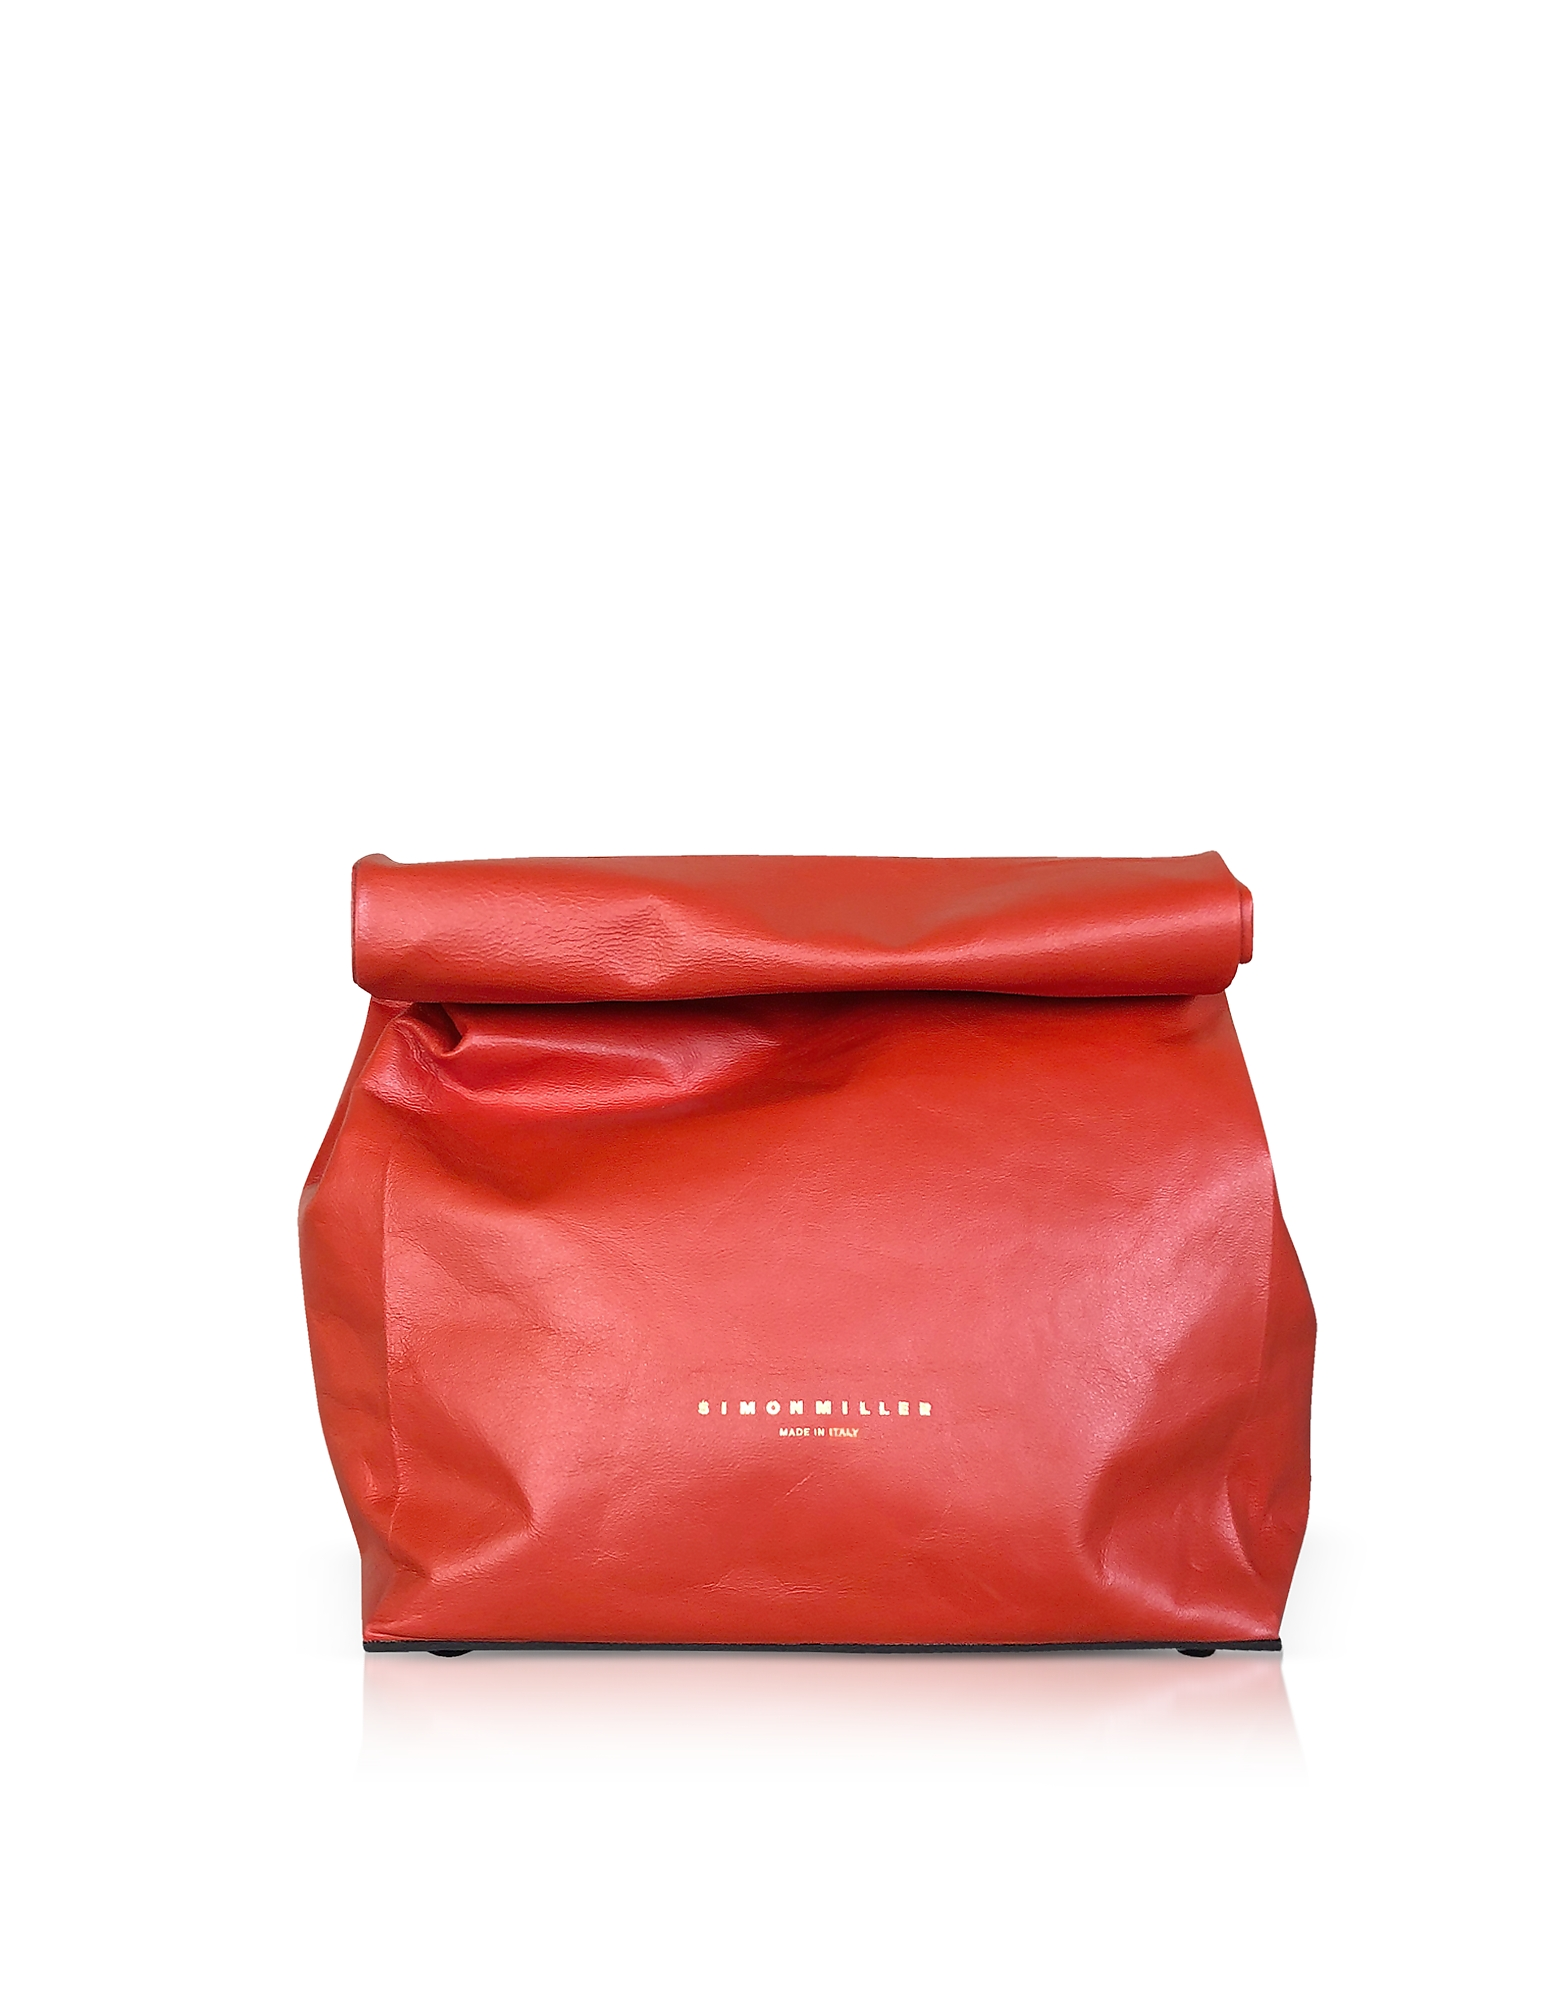 Image of Simon Miller Designer Handbags, Red Leather 20cm Lunch Bag